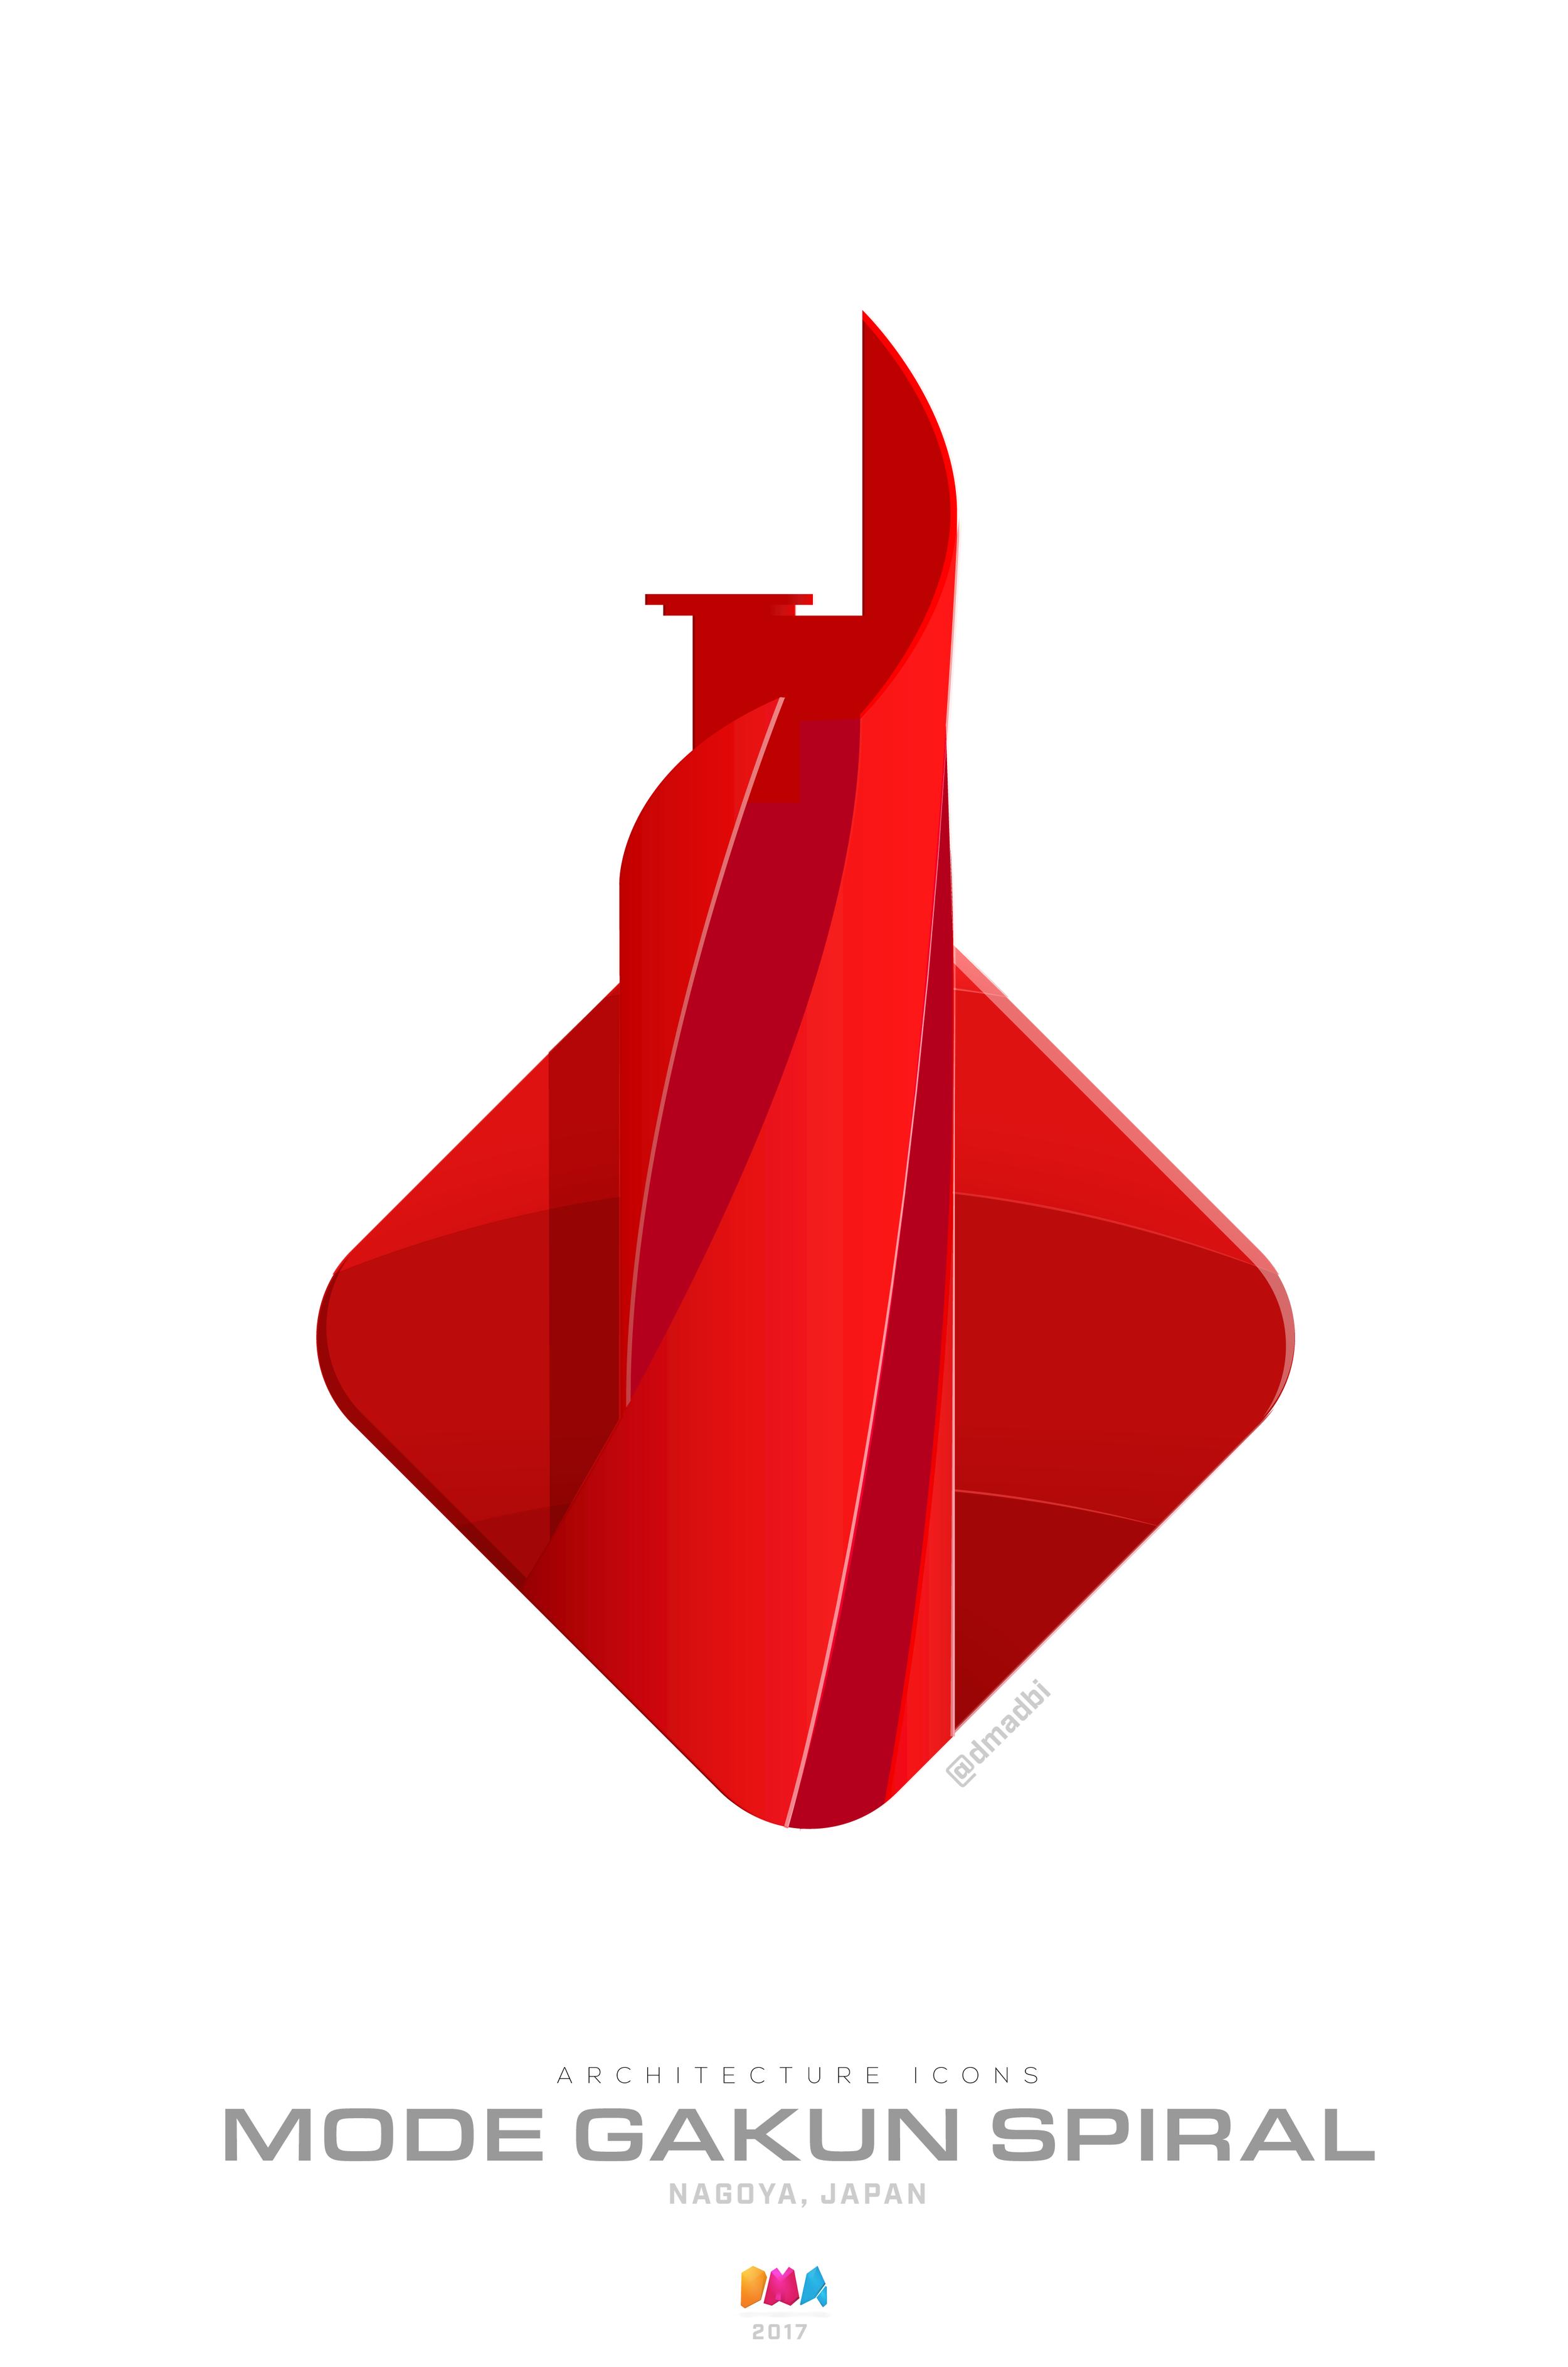 ArchitectureIcons_11-Mode Gakun Spiral.png